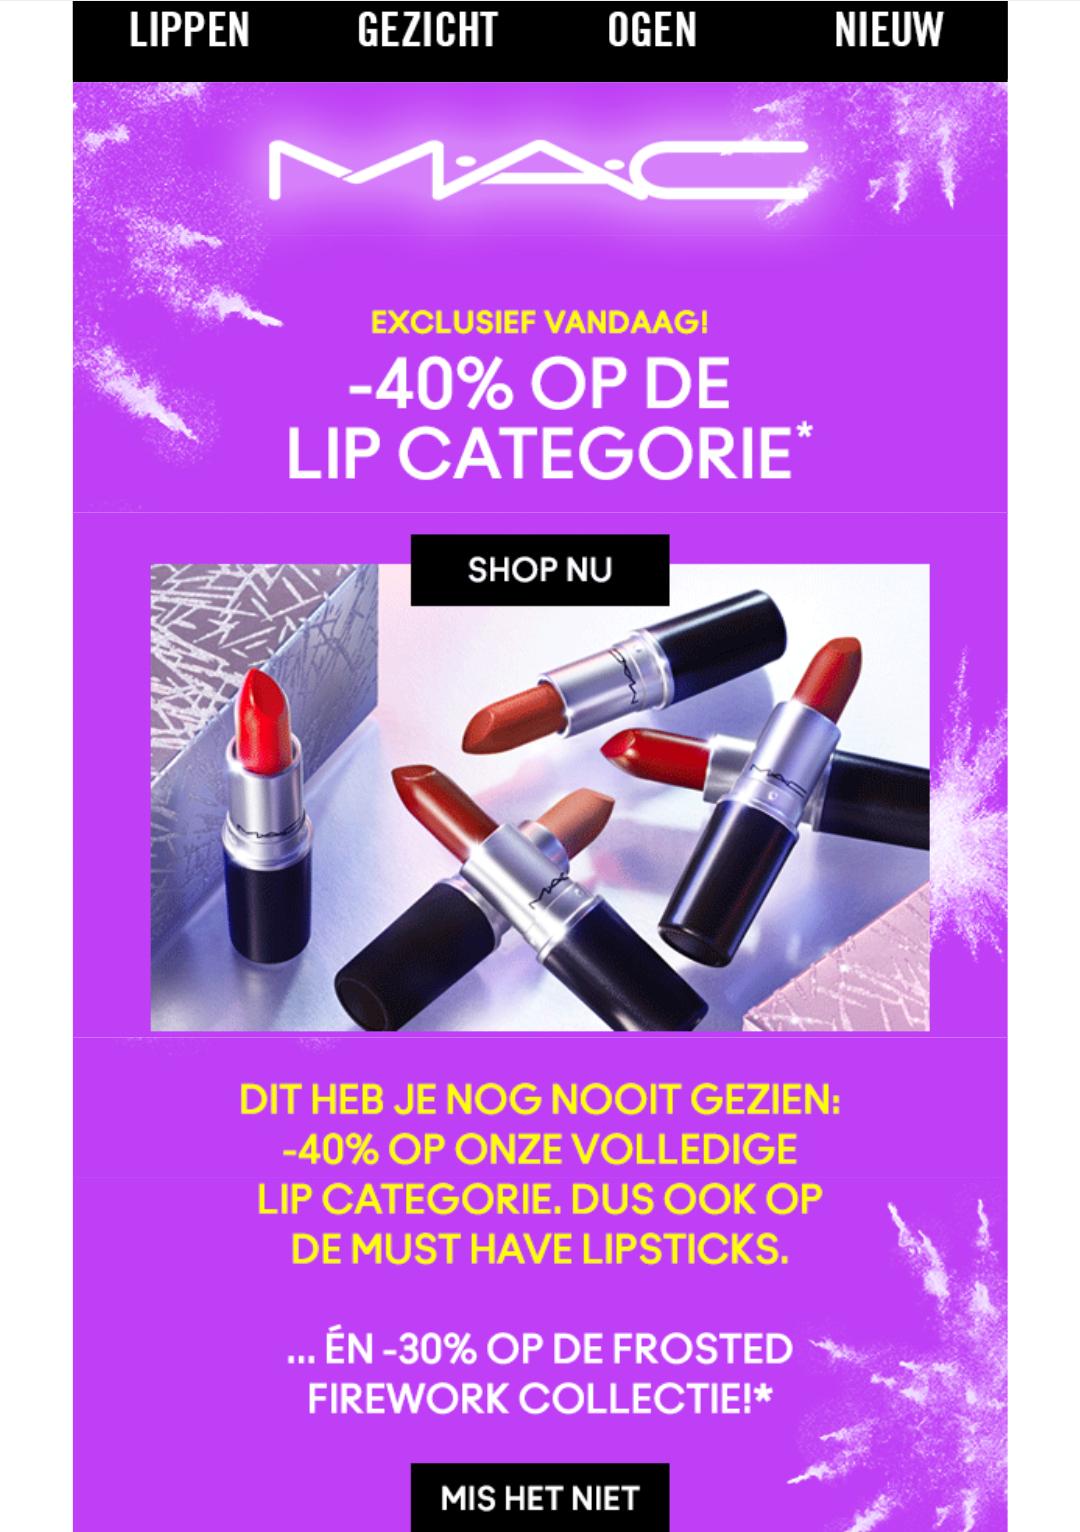 Mac cosmeticamerk alleen vandaag 40 % korting op lippen.